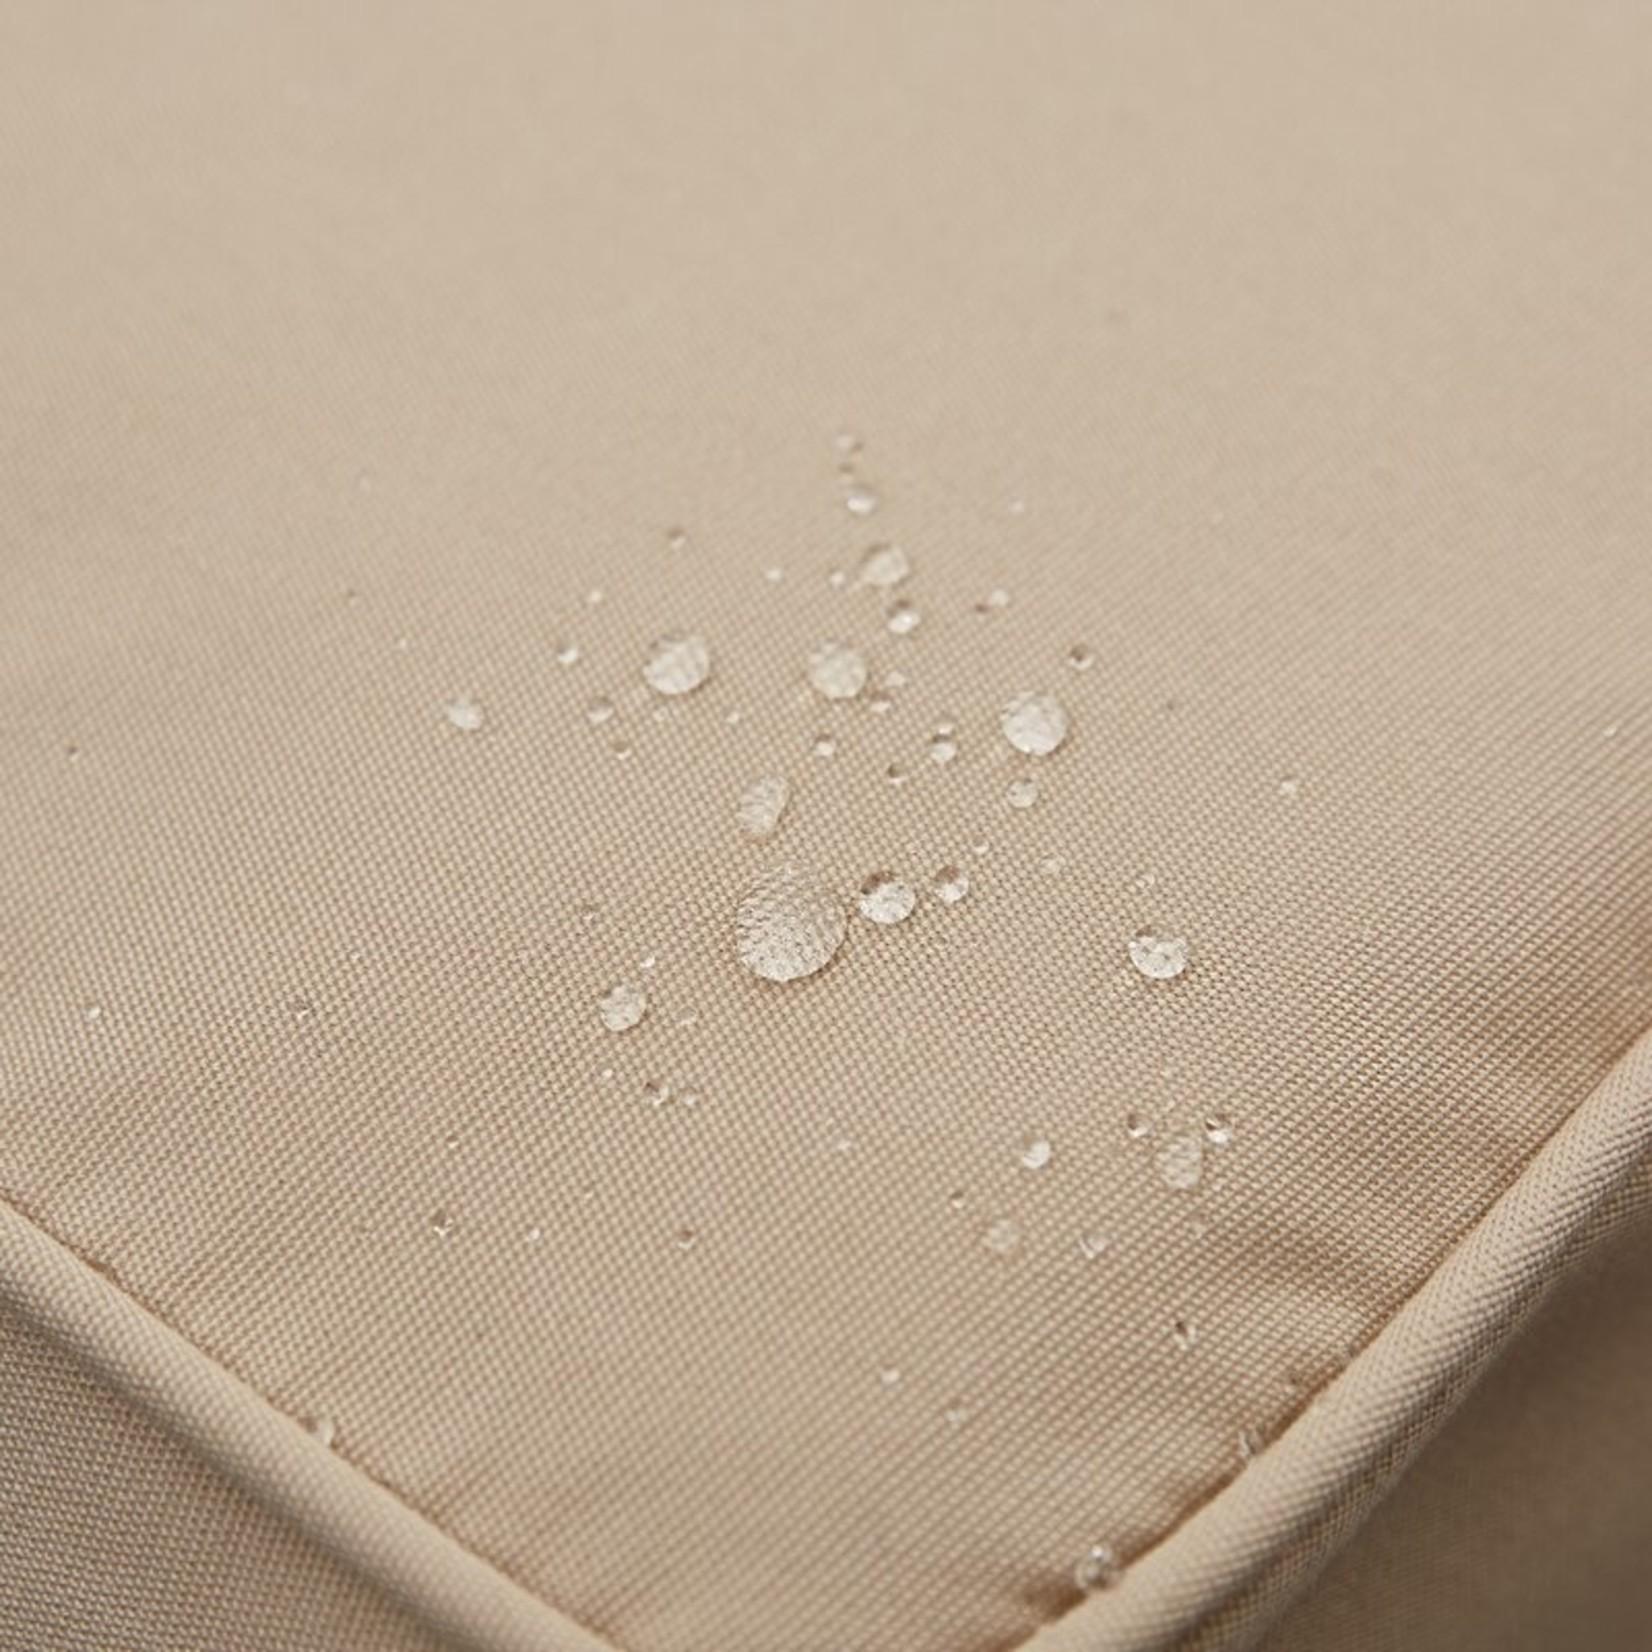 *Outdoor Sunbrella Seat Cushion - Cast Silver